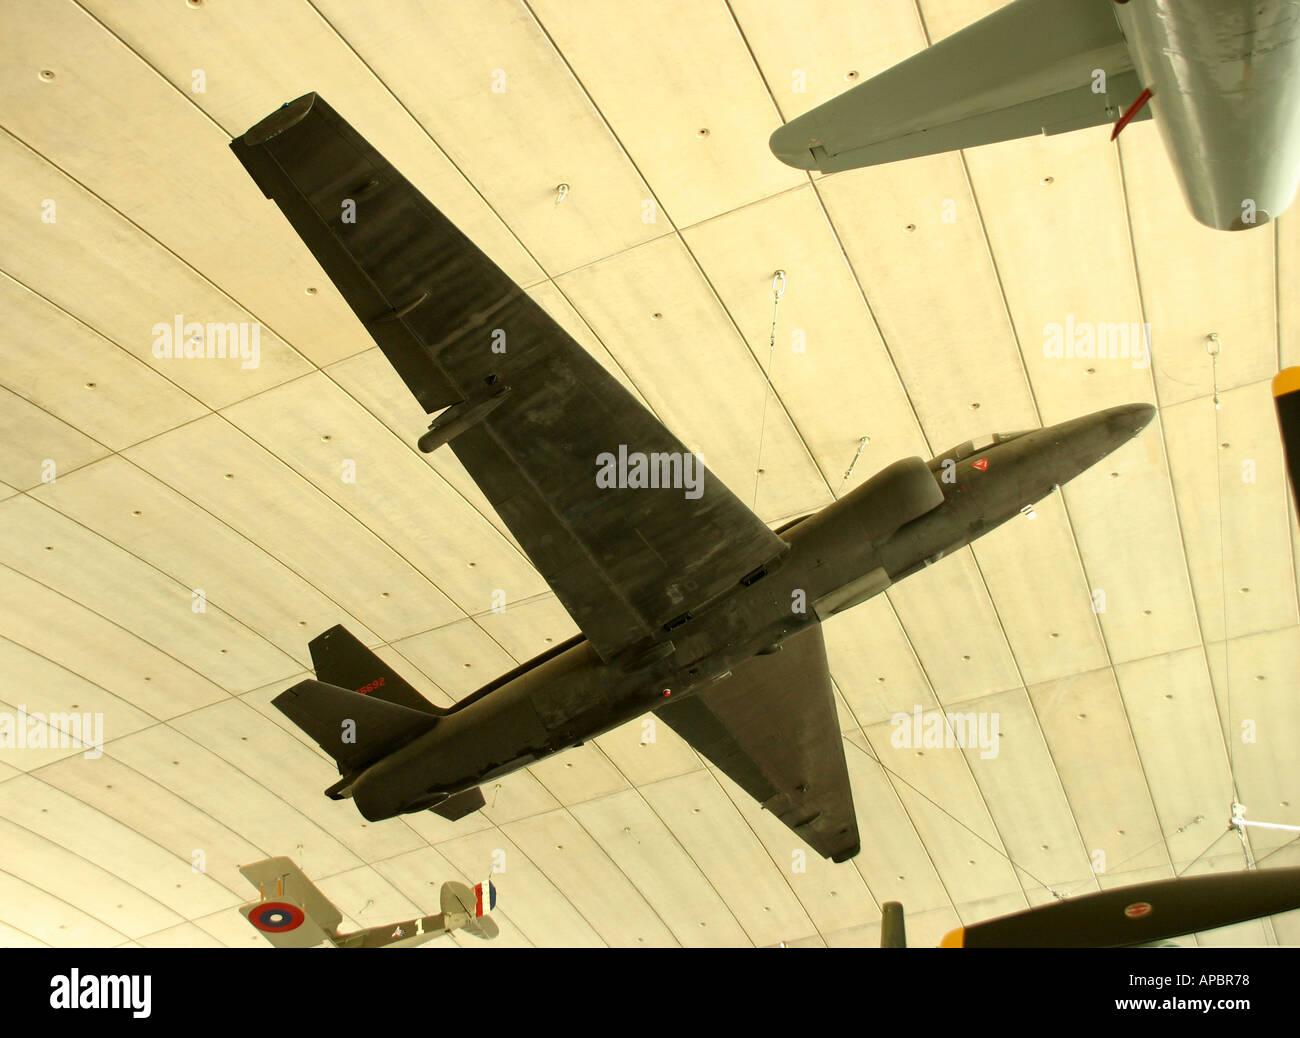 U2 Spy plane Imperial War Museum Duxford Stock Photo